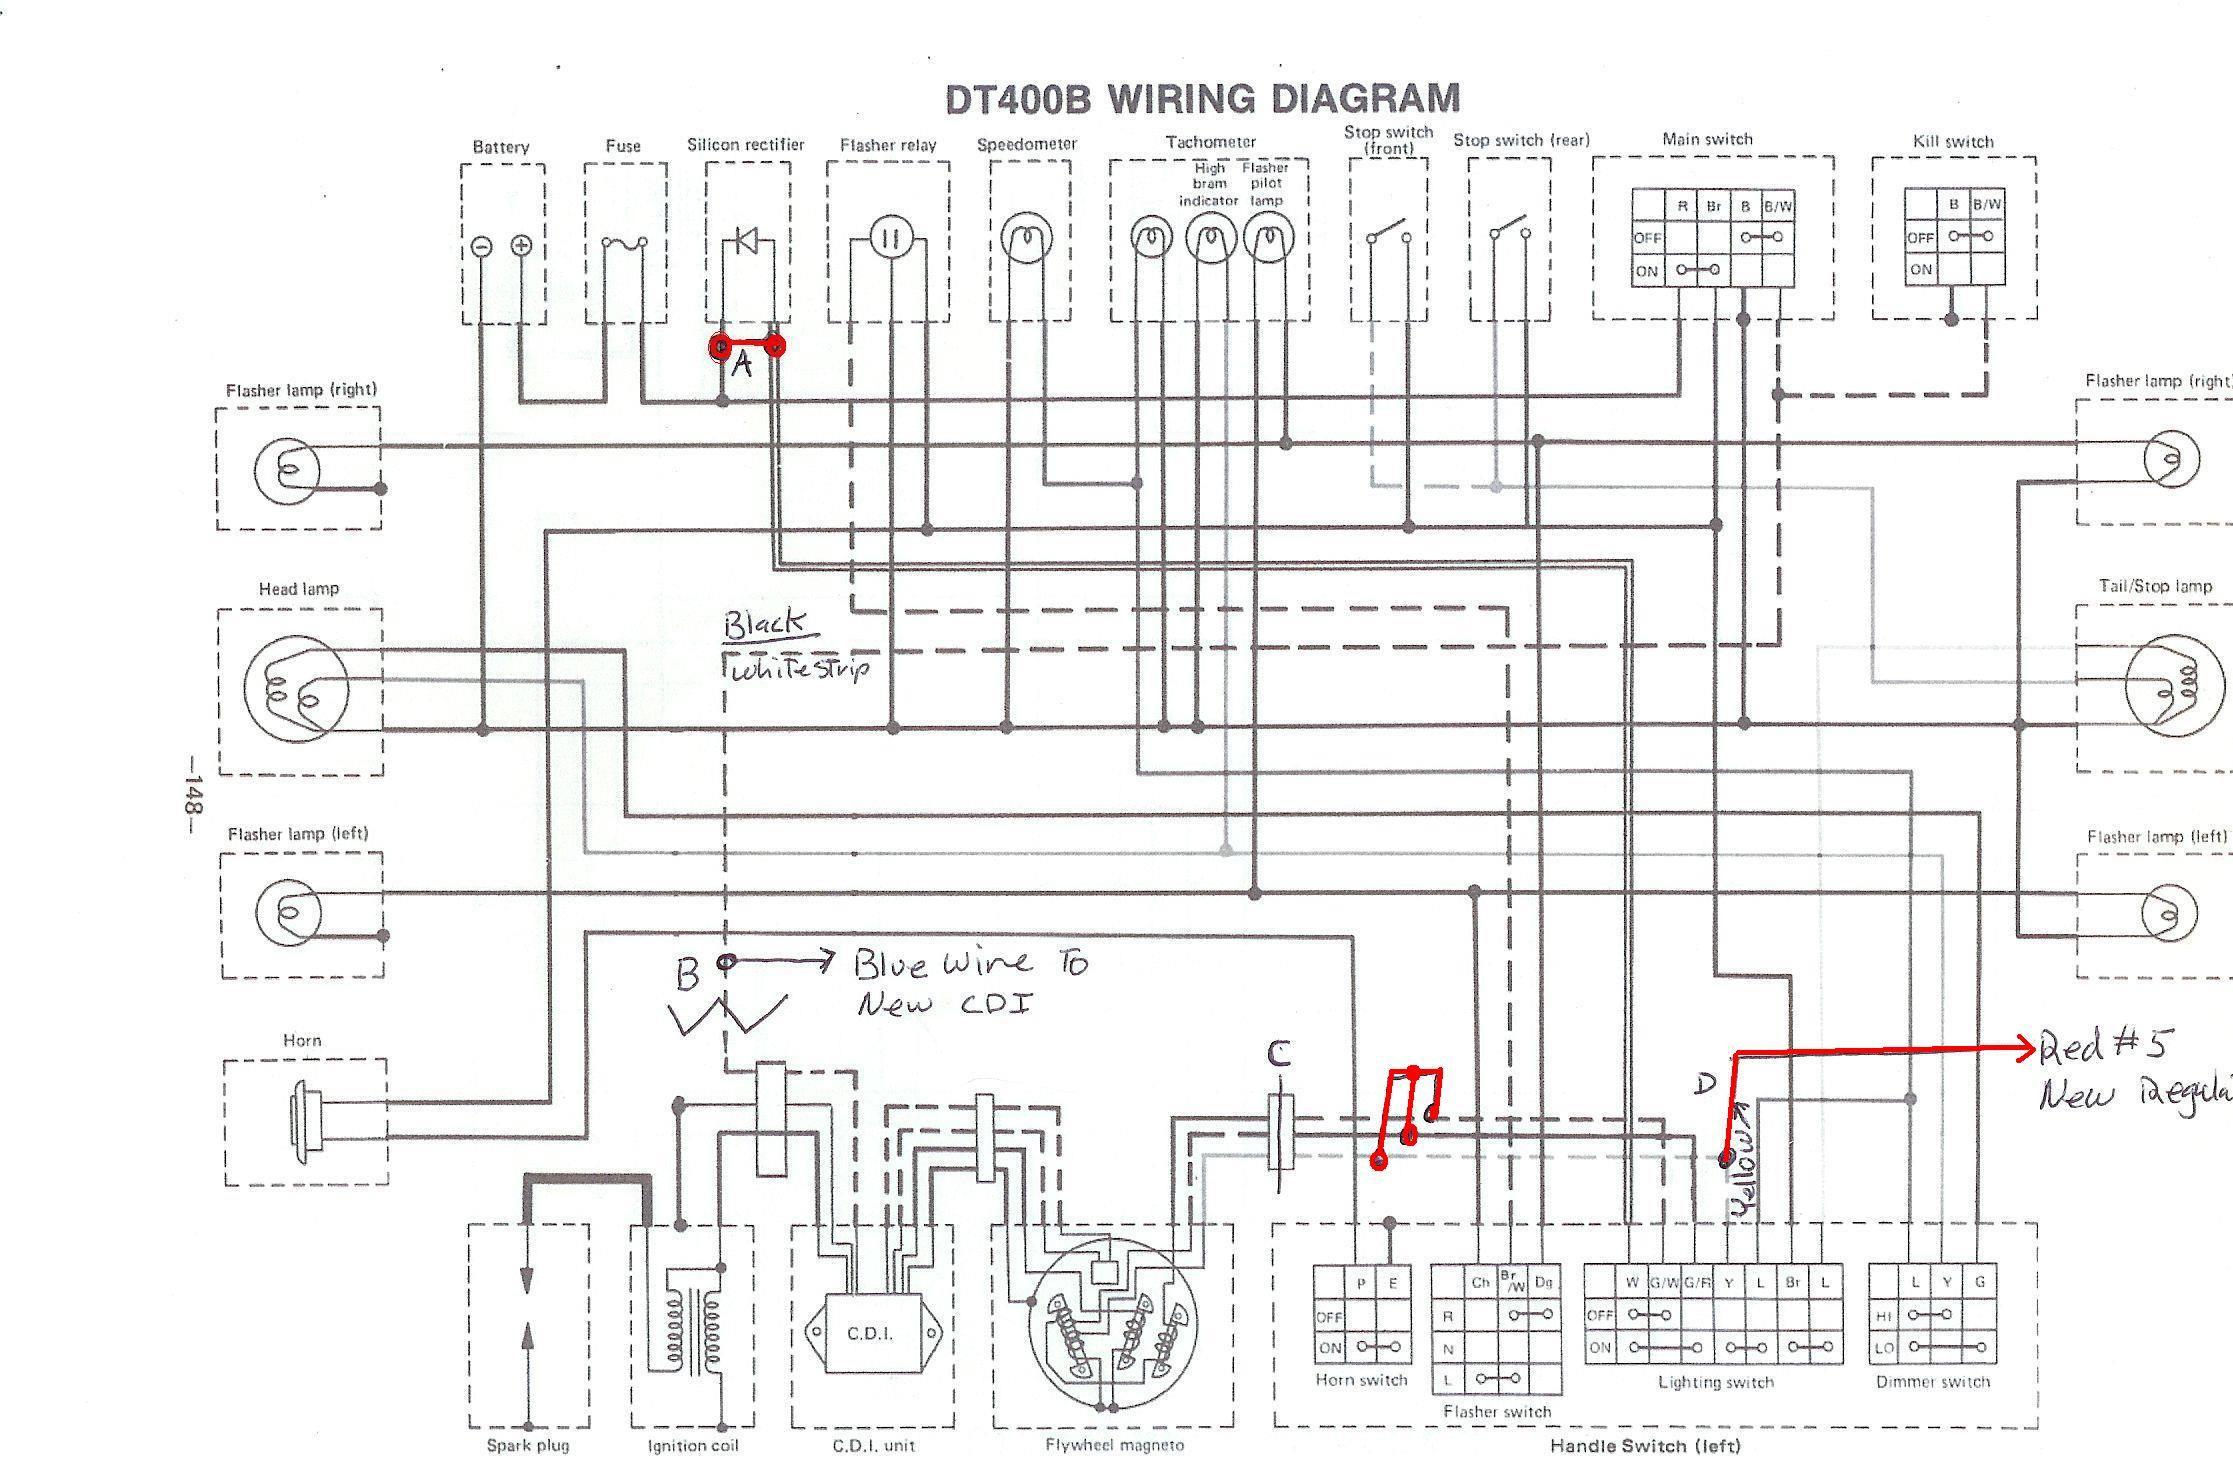 wiring diagram for ridgid threader dw 0758  ridgid r4510 parts list and diagram ereplacementpartscom  ridgid r4510 parts list and diagram